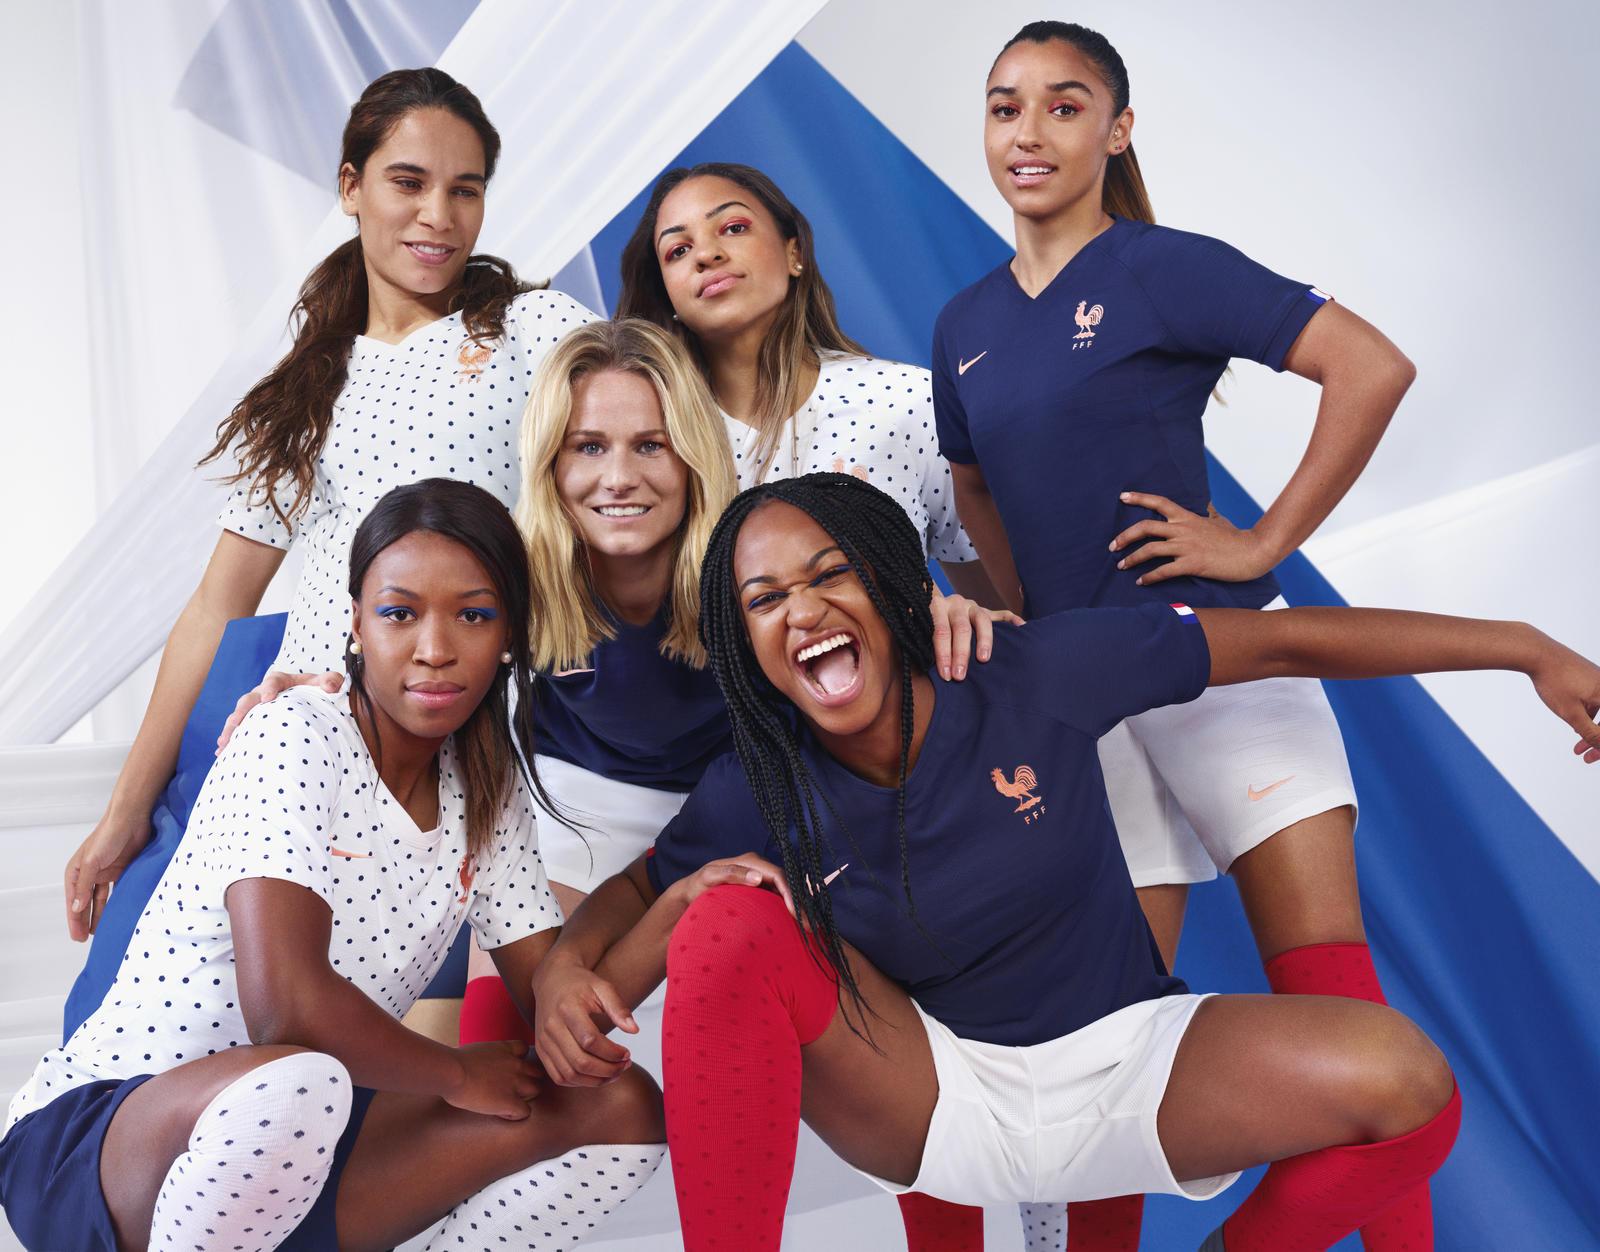 maglie mondiale femminile 2019